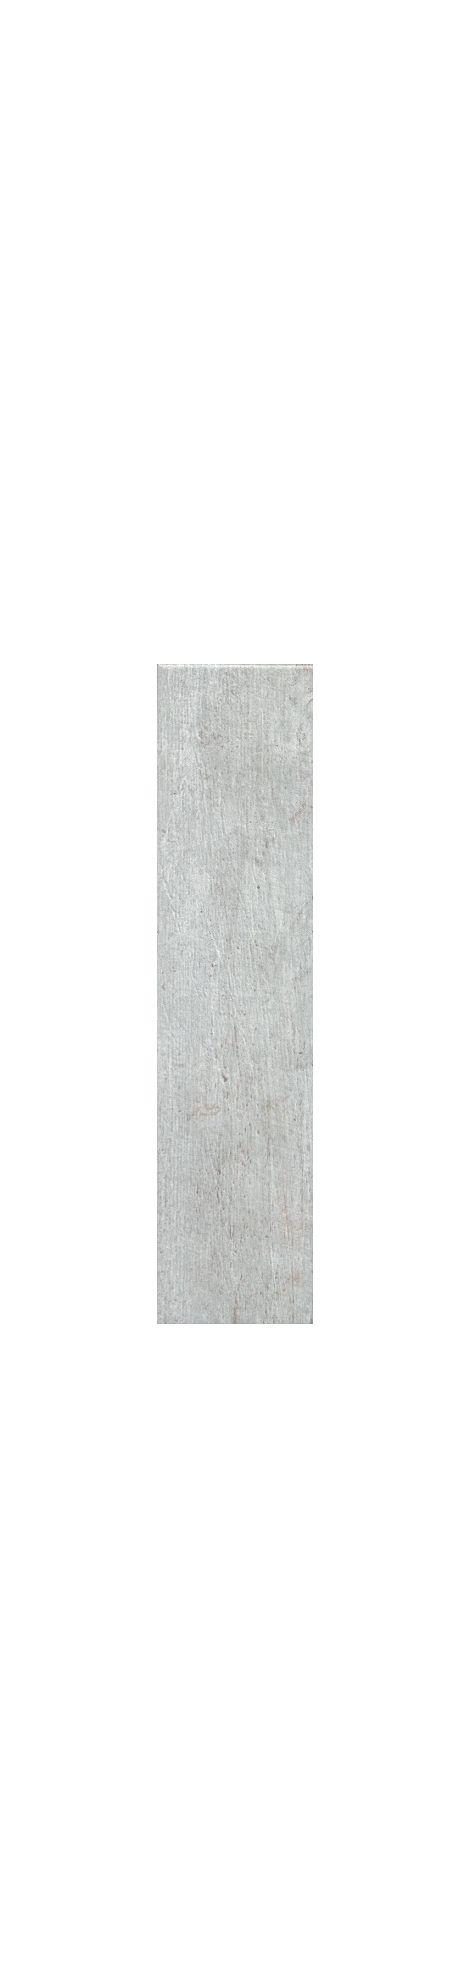 SG401700N | Кантри Шик серая напольная плитка